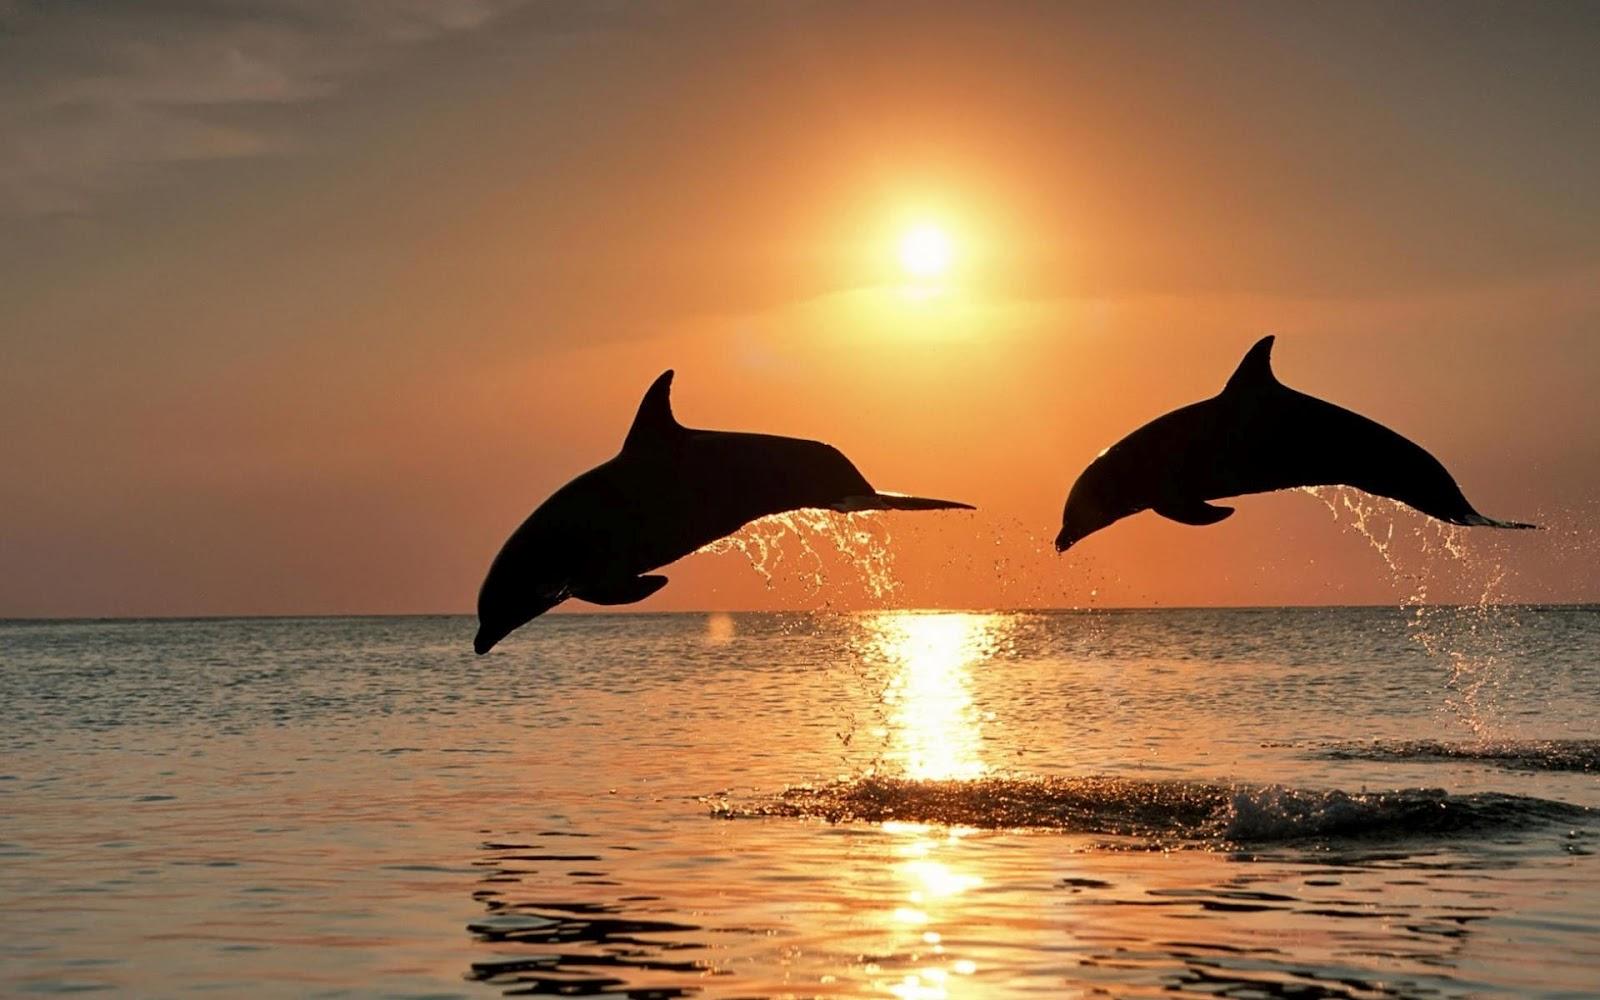 animales marinos imagenes - Descargar fotos animales marinos Softonic